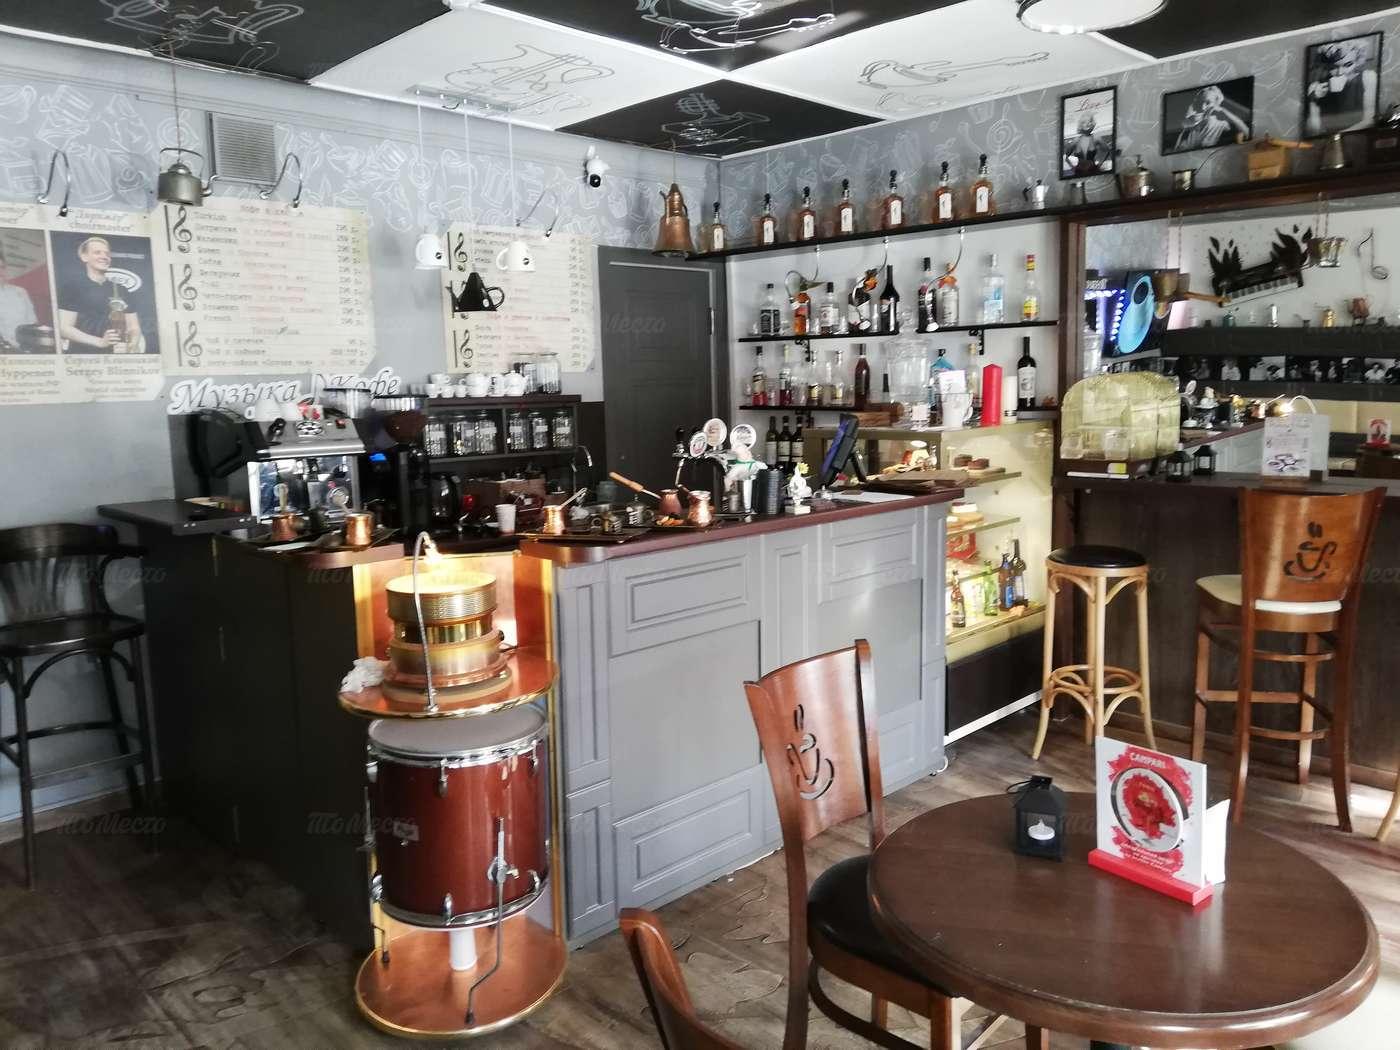 Кафе Музыка кофе на набережной реки Фонтанки фото 6